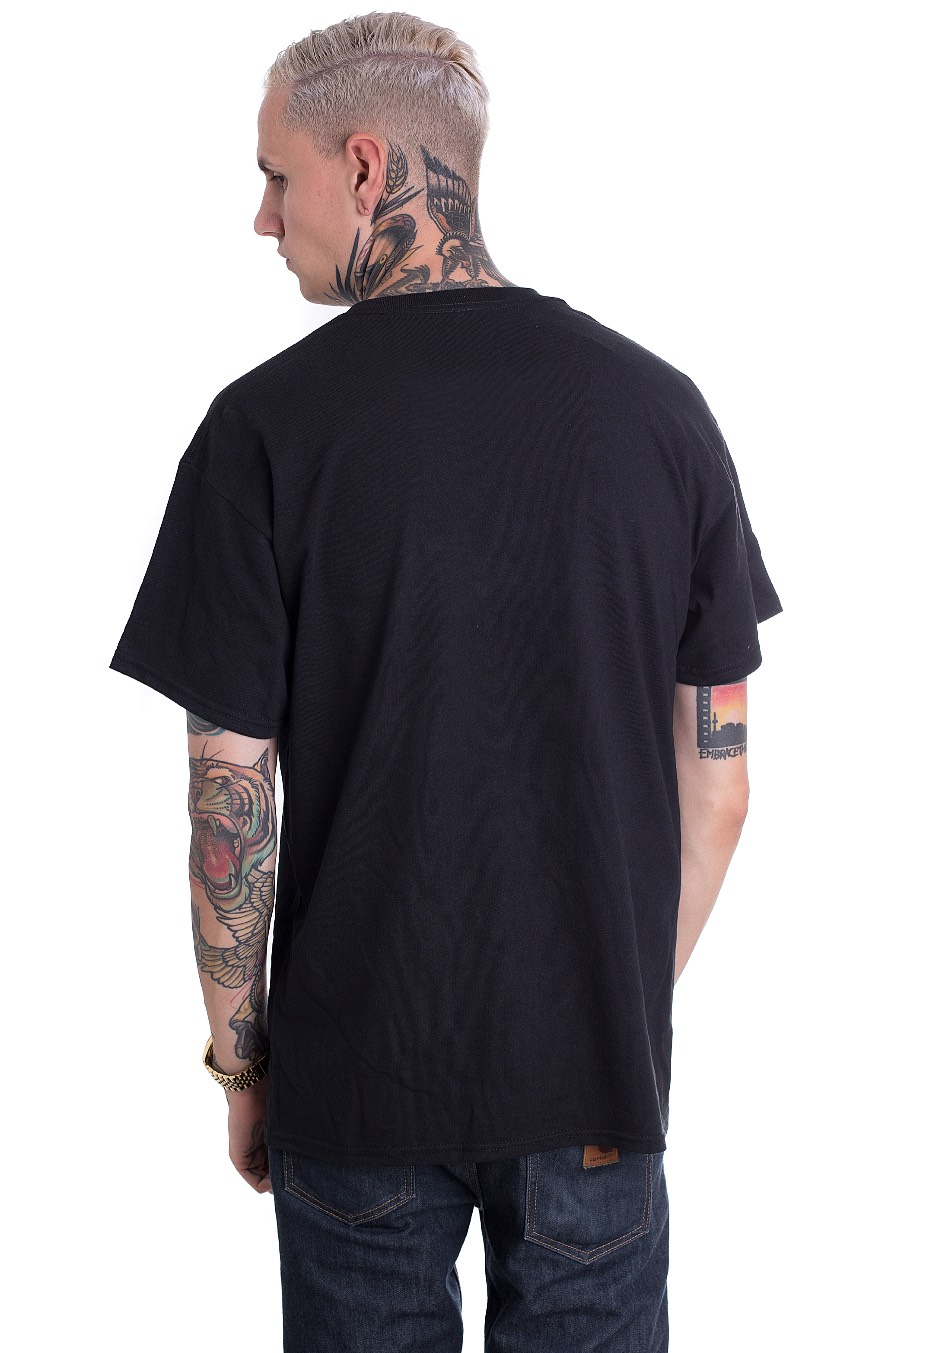 6ca84881c0ac Thrasher - Roses - T-Shirt - Streetwear Shop - Impericon.com AU